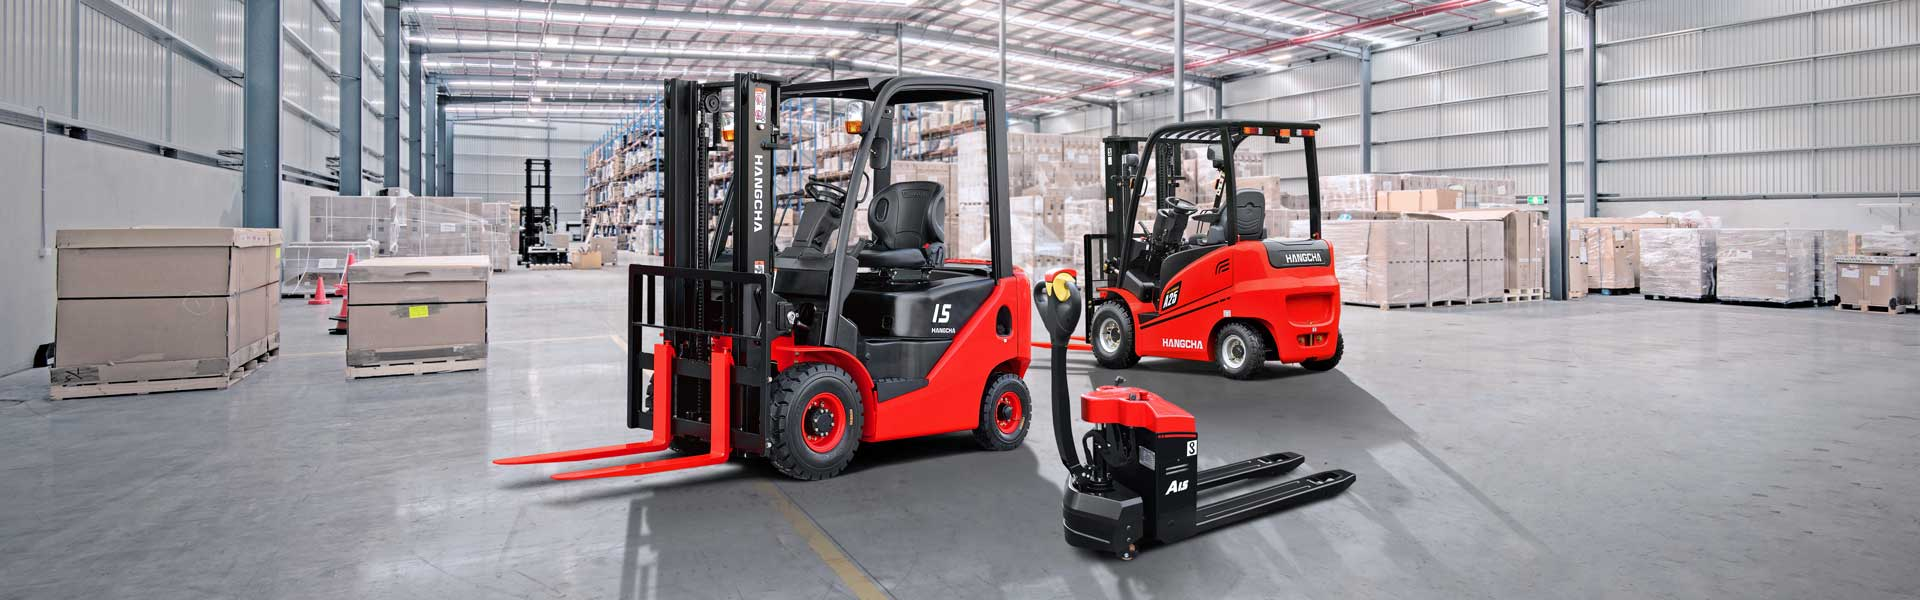 Warehouse Range Hangcha Trucks